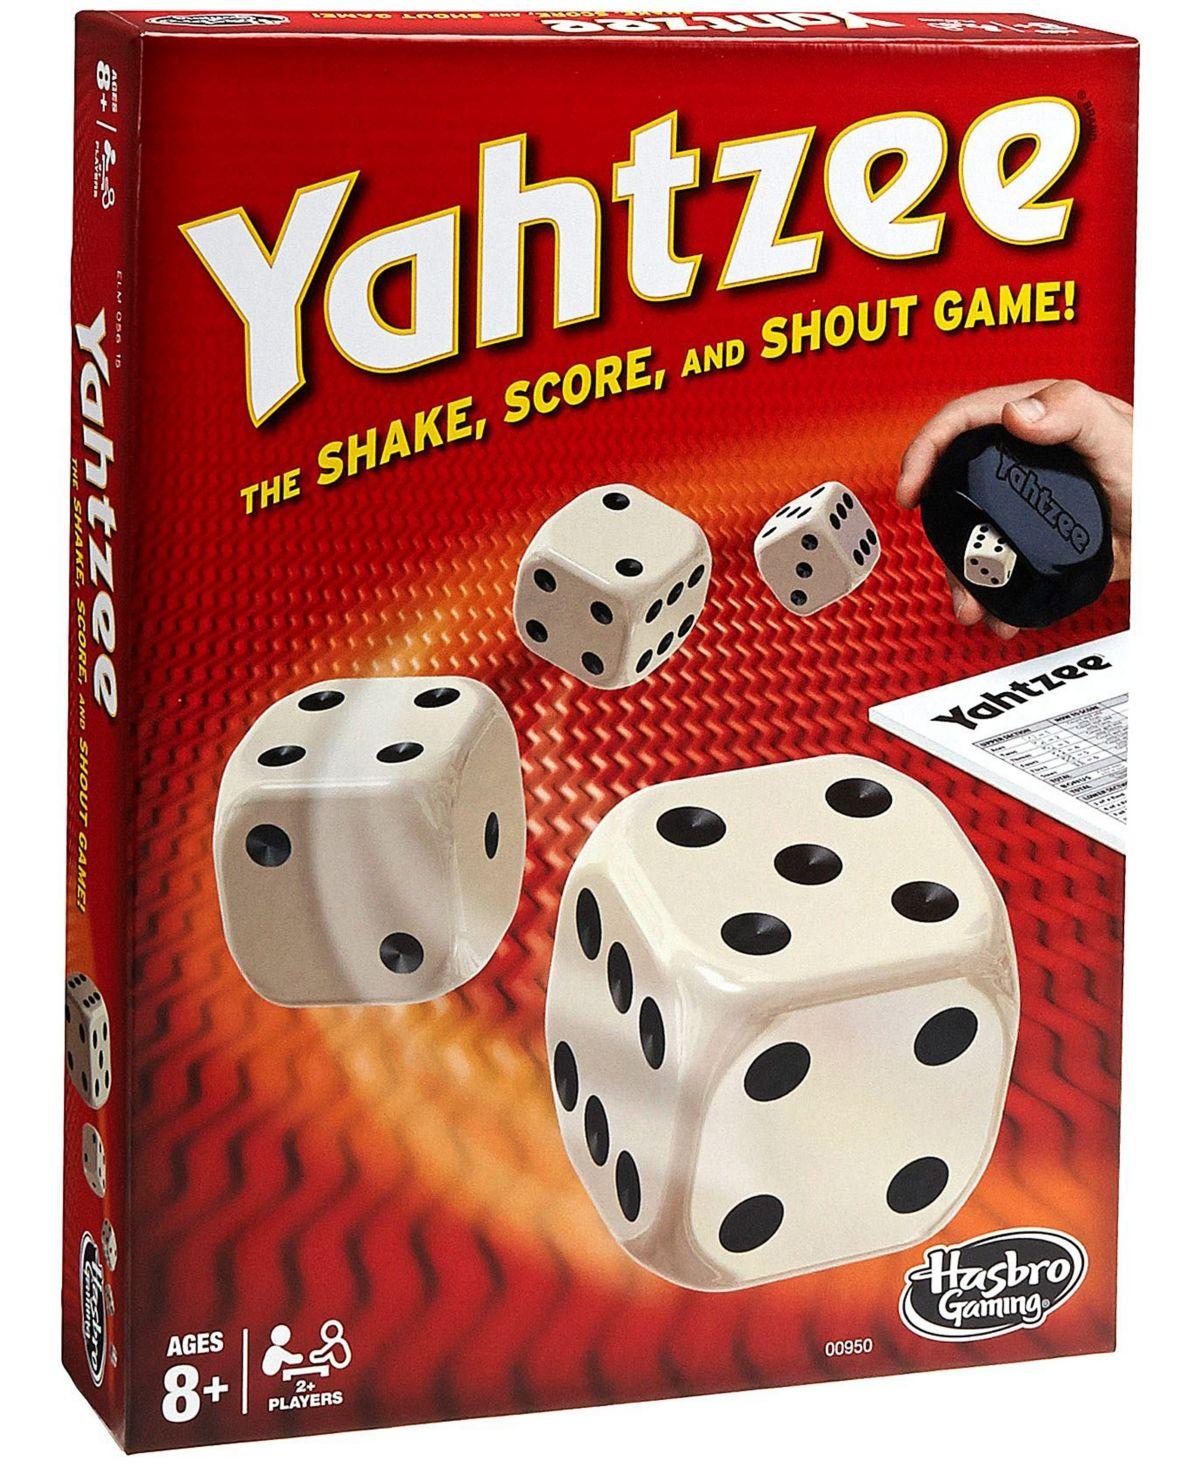 Crayola yahtzee game reviews kids macys in 2020